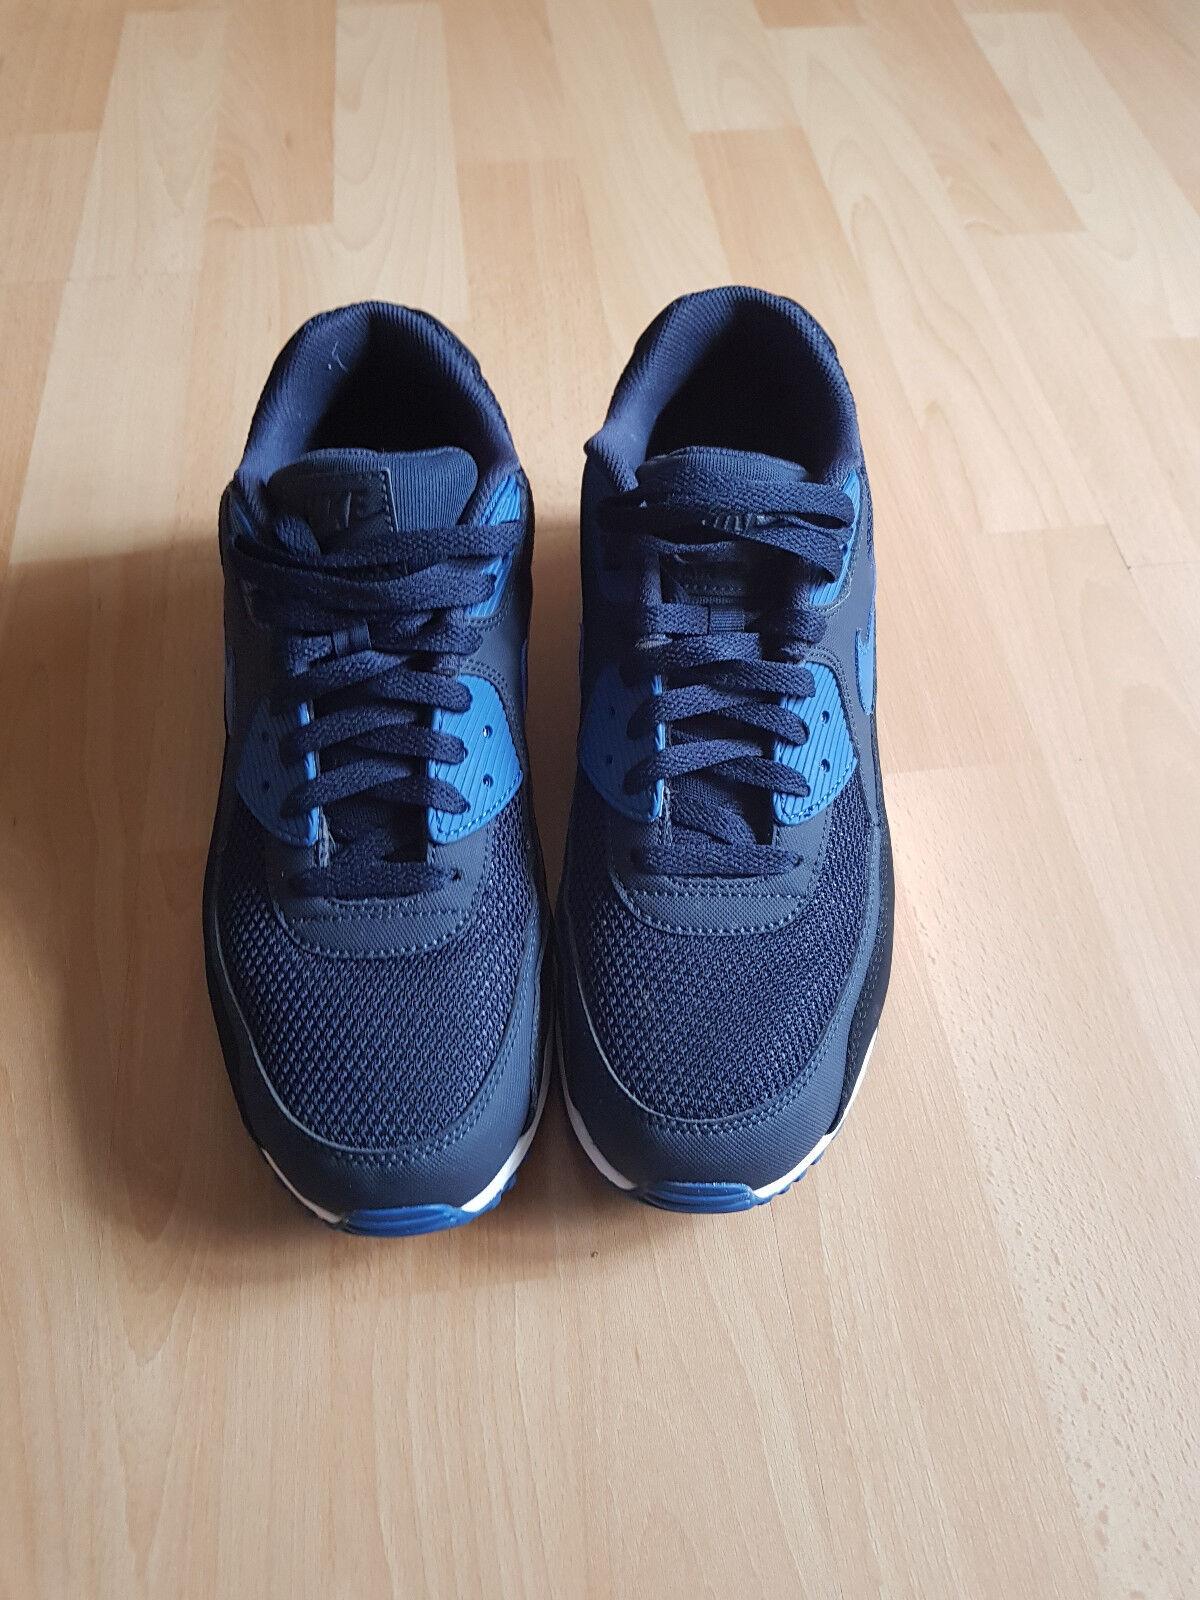 Nike Air Max 90 Essential /Schuh/Turnschuh/Sneaker Herren